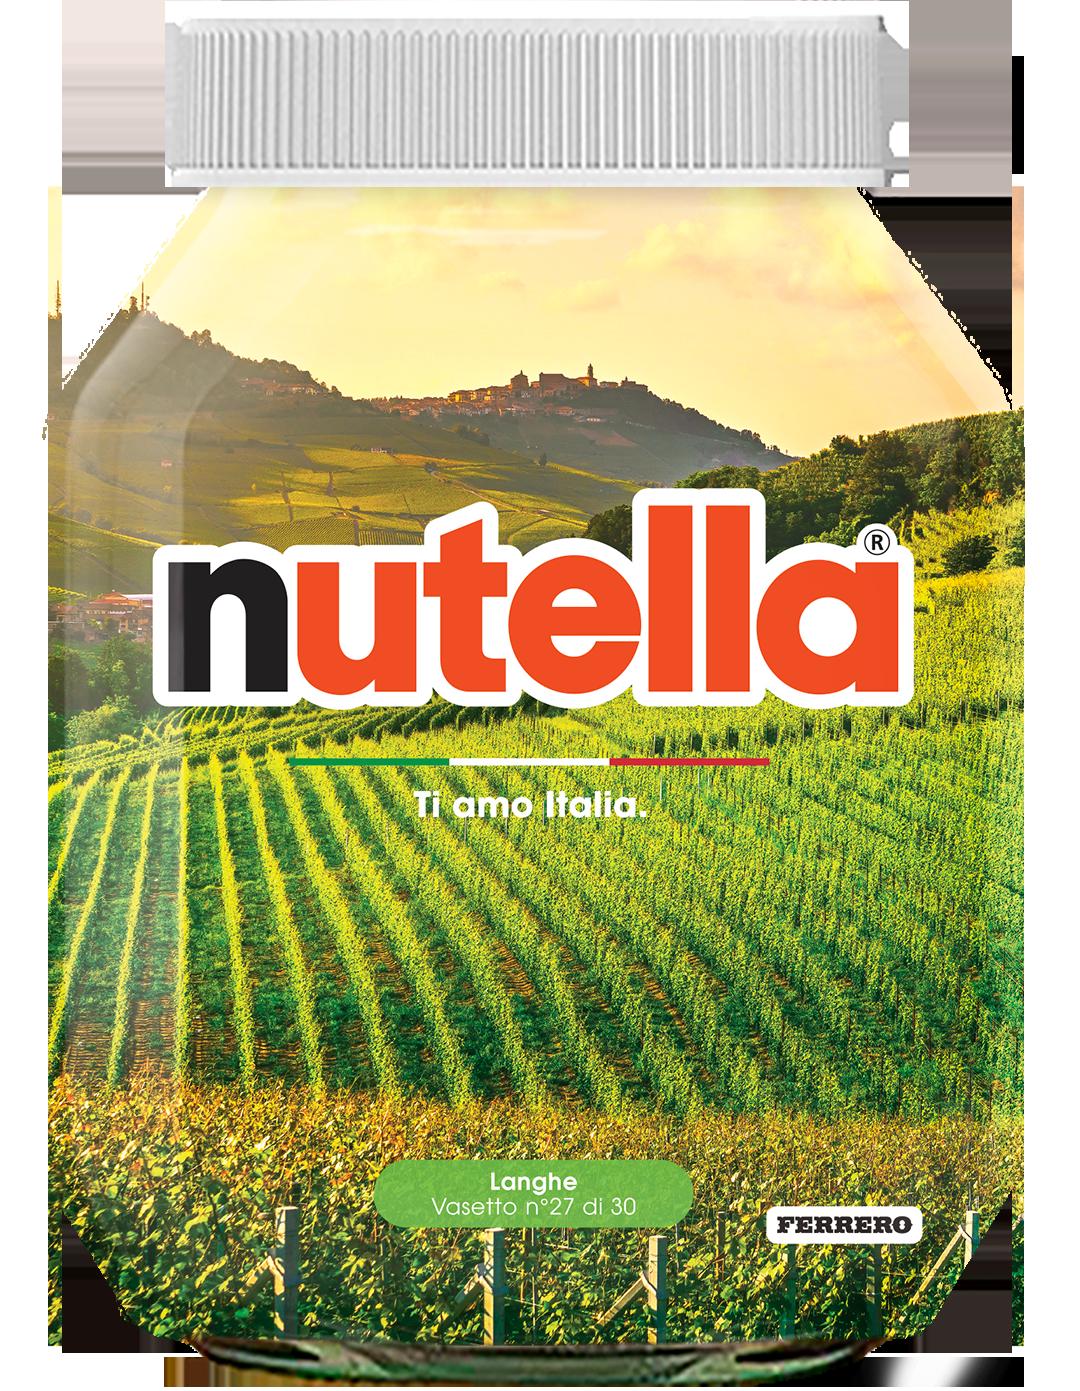 Piemonte - Langhe - i vasetti di nutella dedicati all'italia